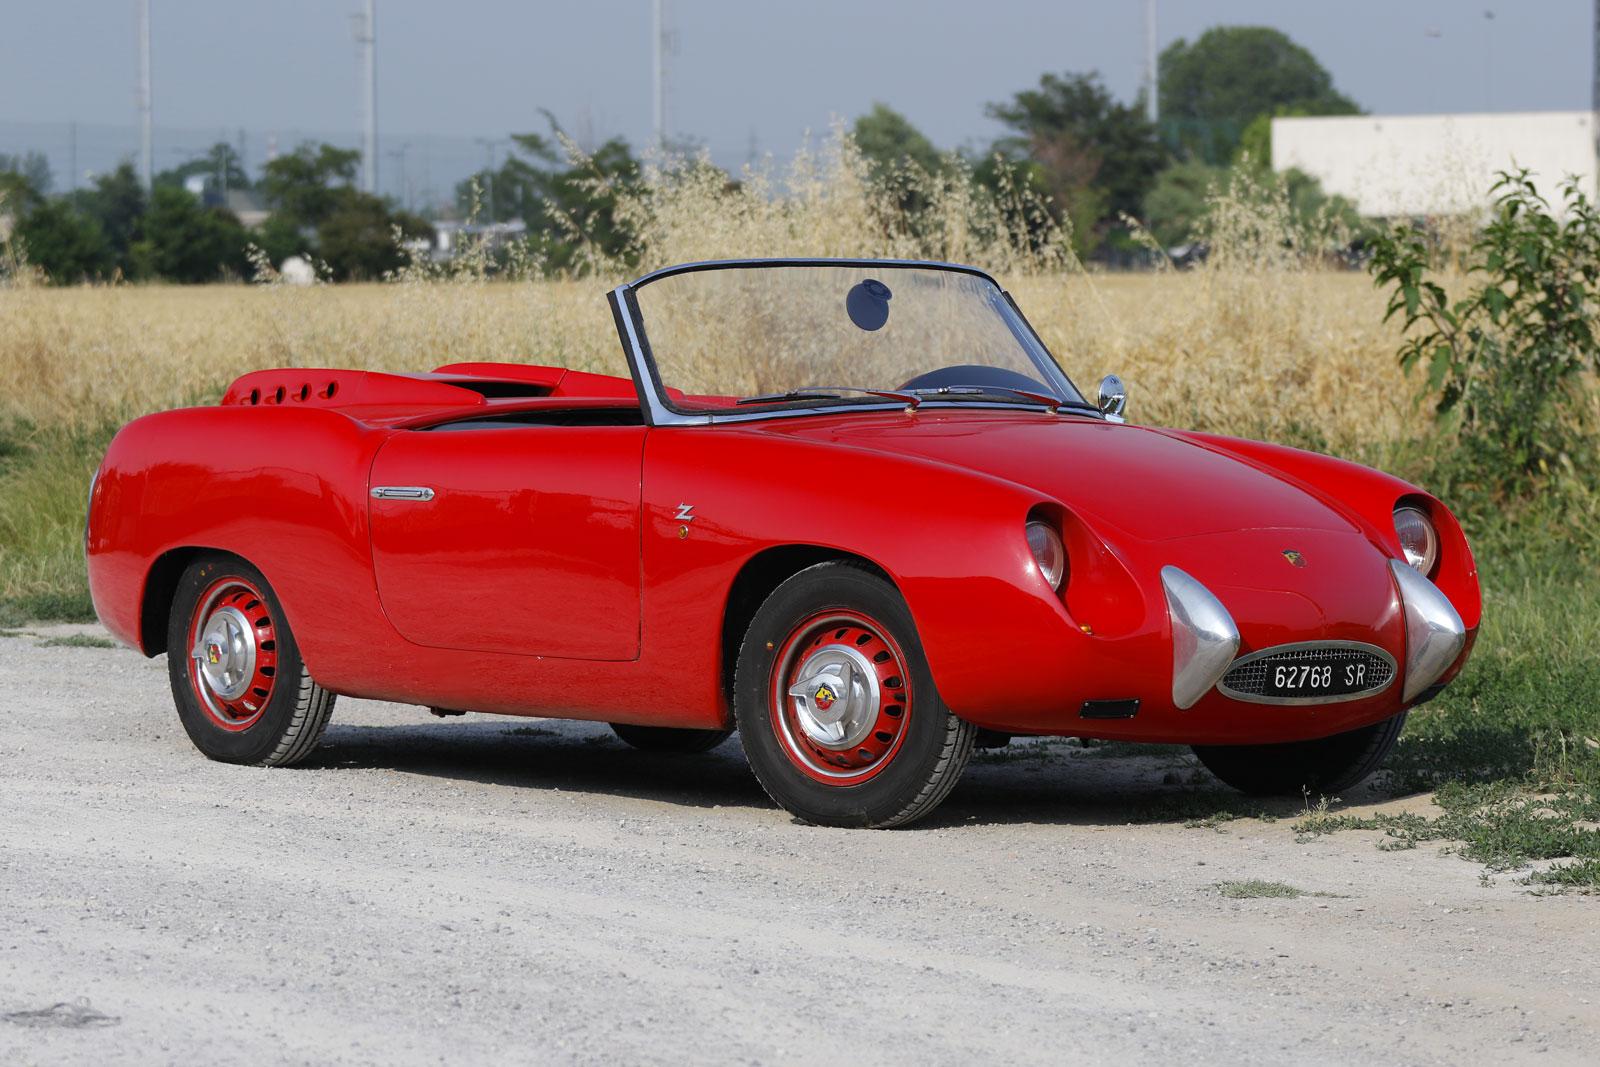 Fiat Abarth 750 Spyder (Zagato)